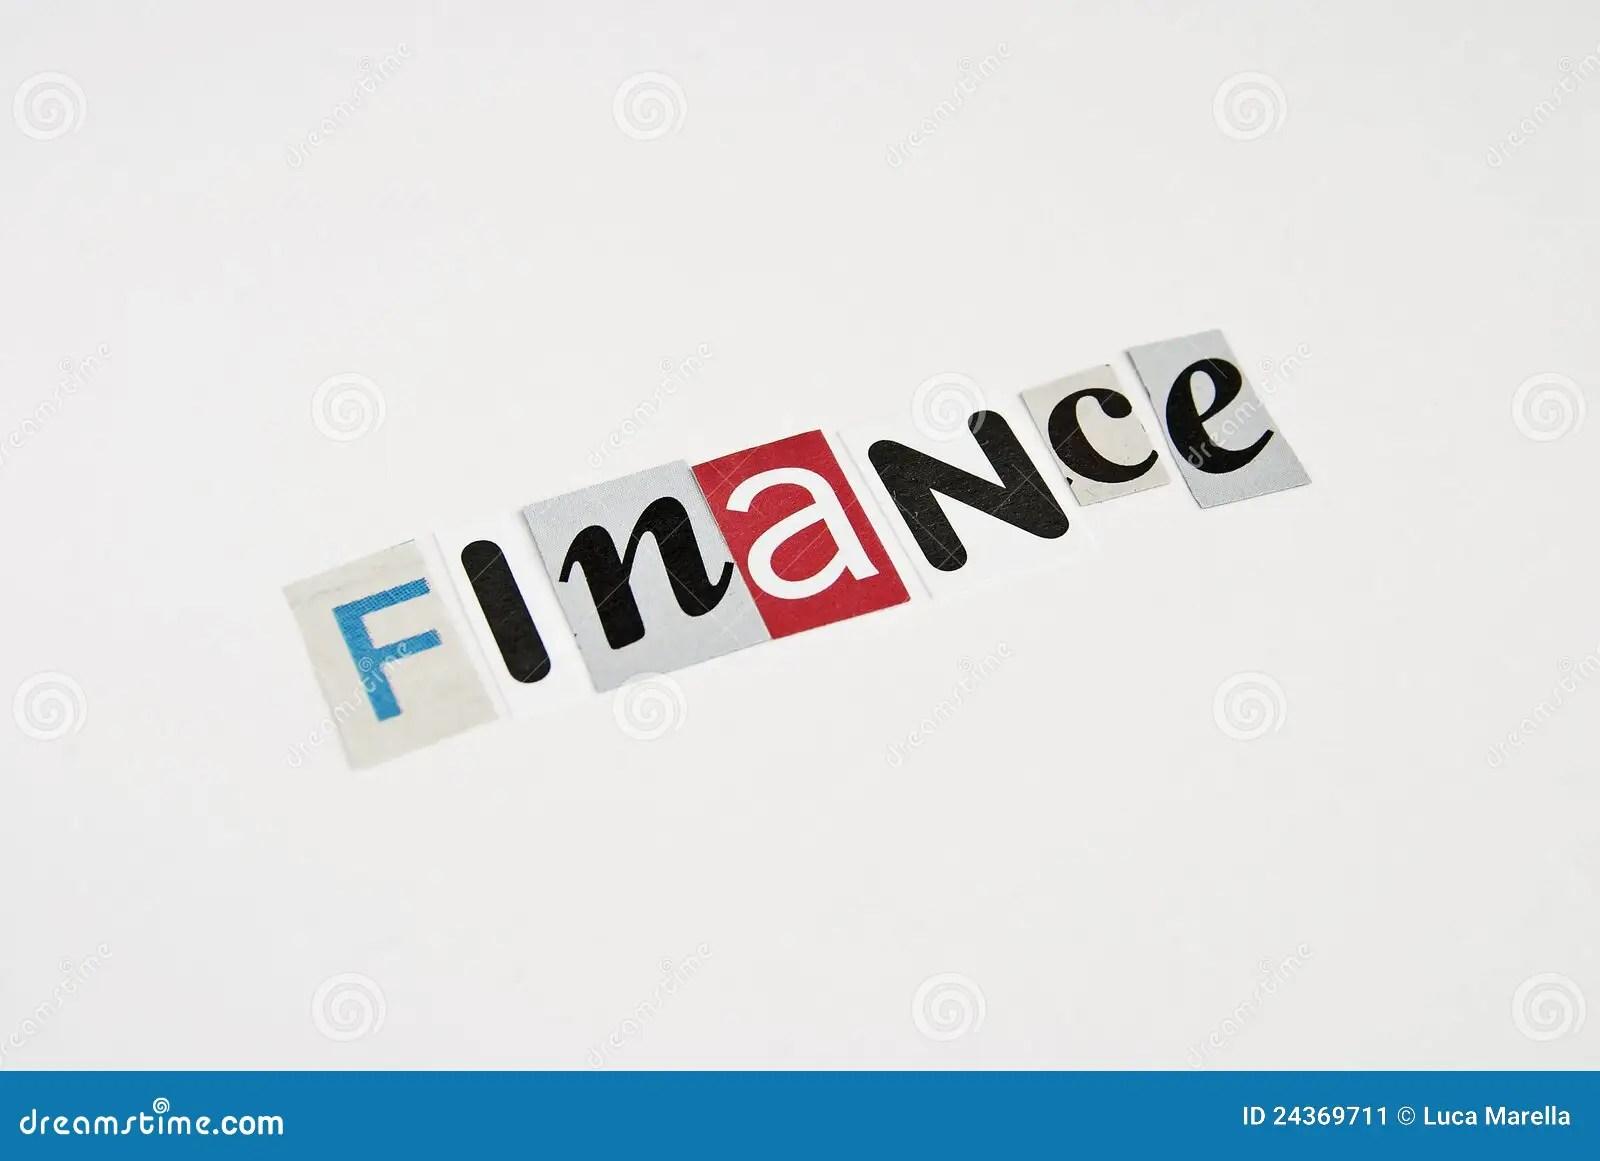 Finance Writing Ransom Stock Image